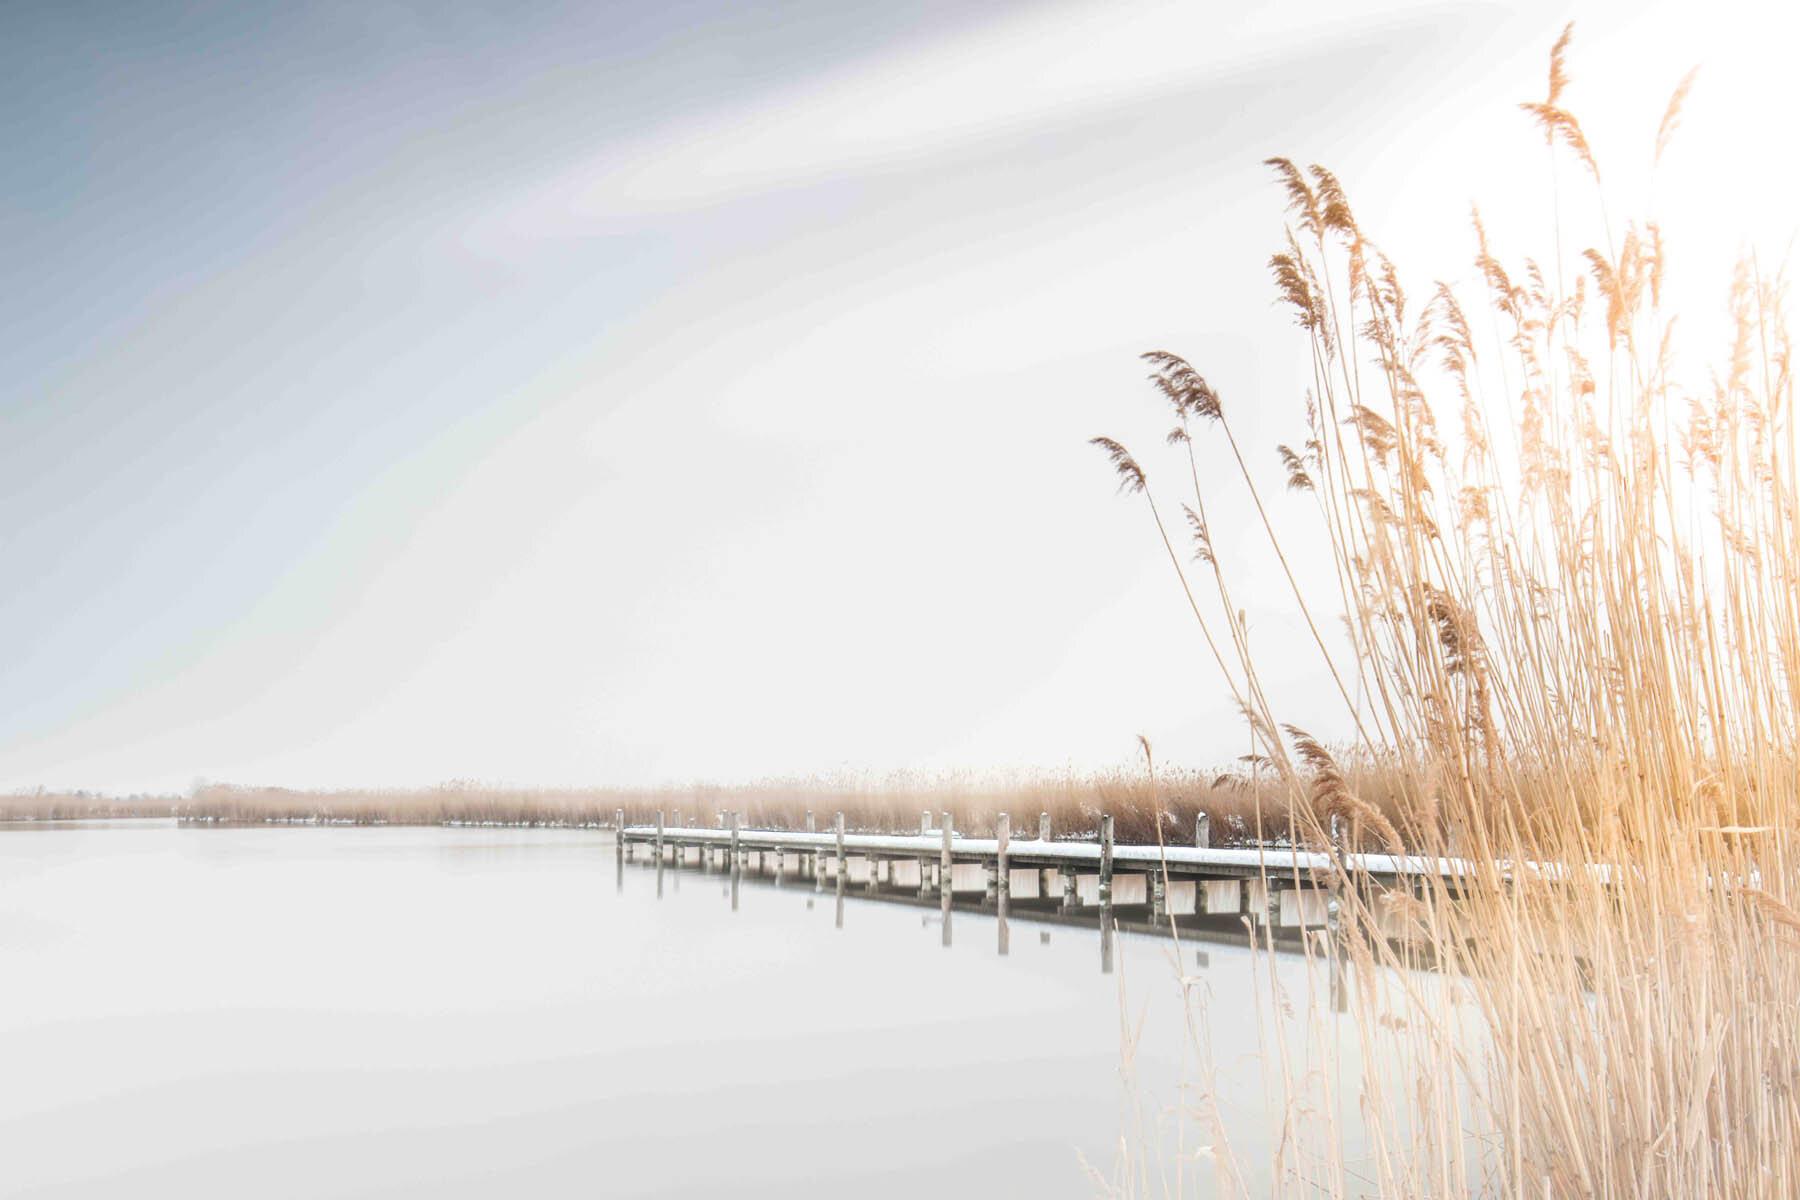 PlateART Duschrückwand mit Motiv Strand und Meer Steg Winter